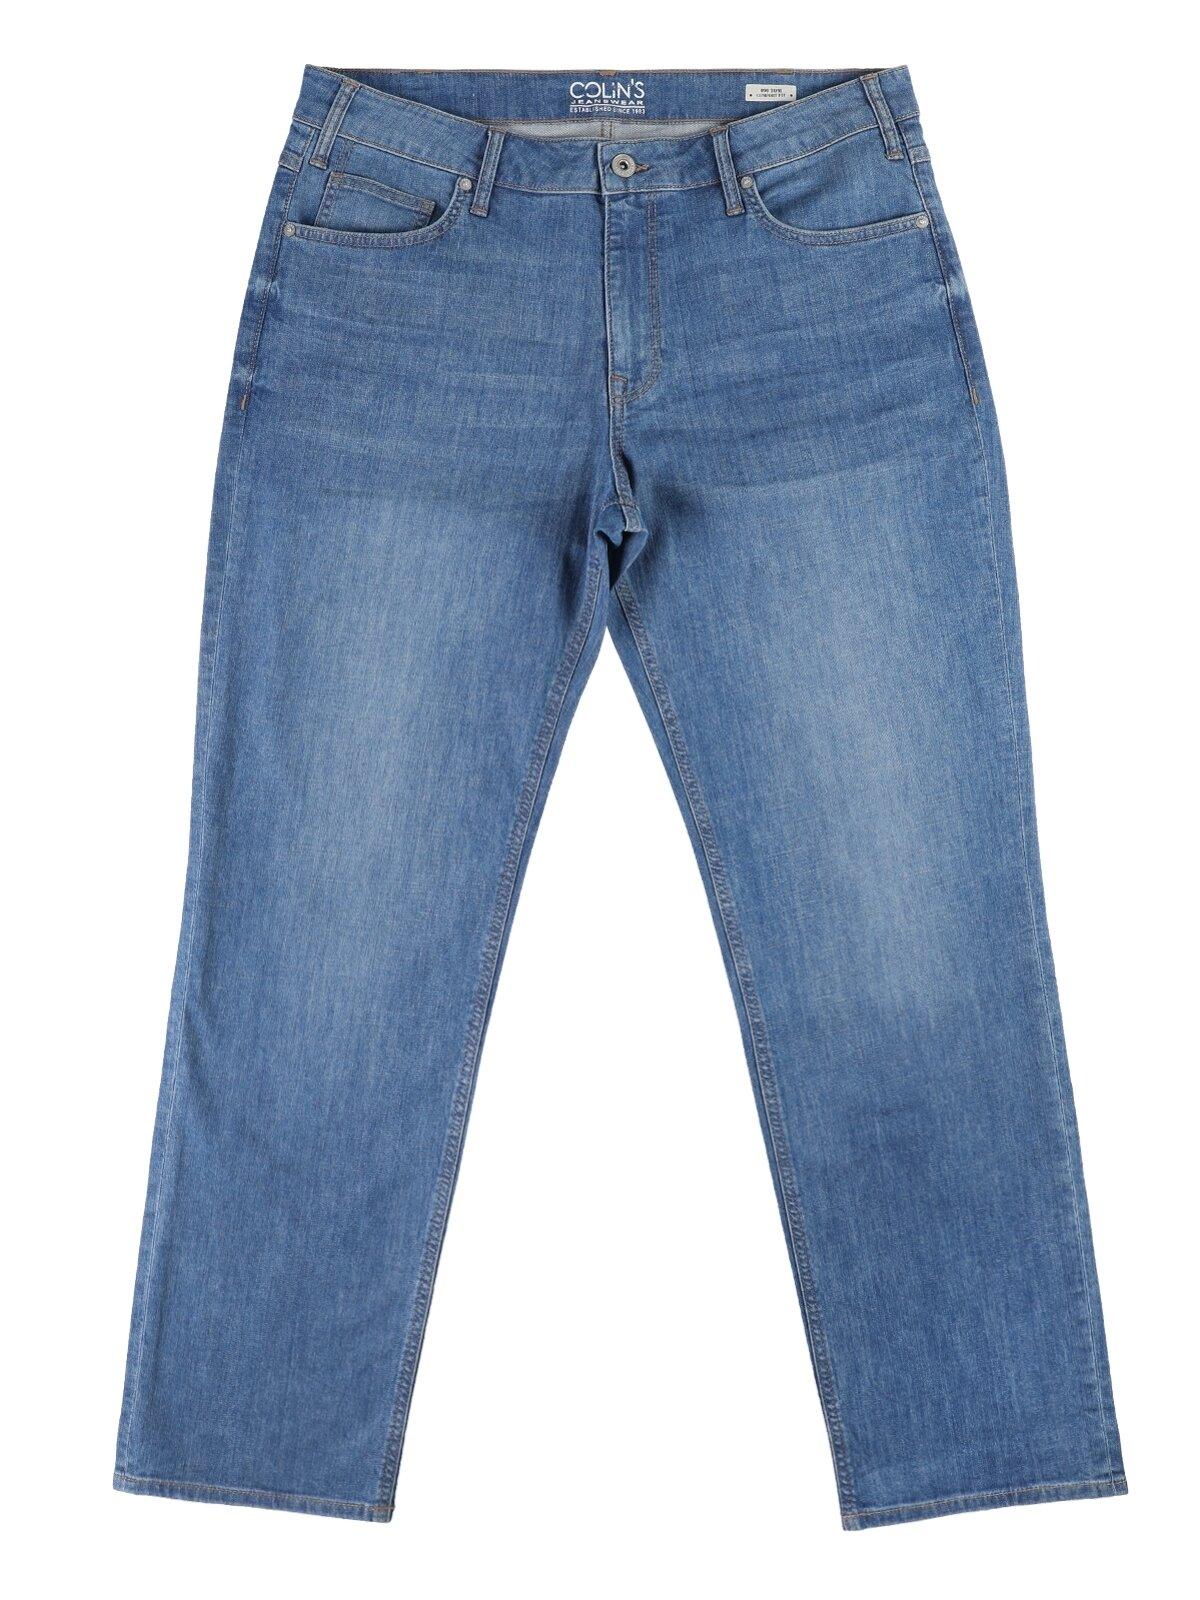 090 Tom Orta Bel Düz Paça Comfort Fit Mavi Erkek Jean Pantolon